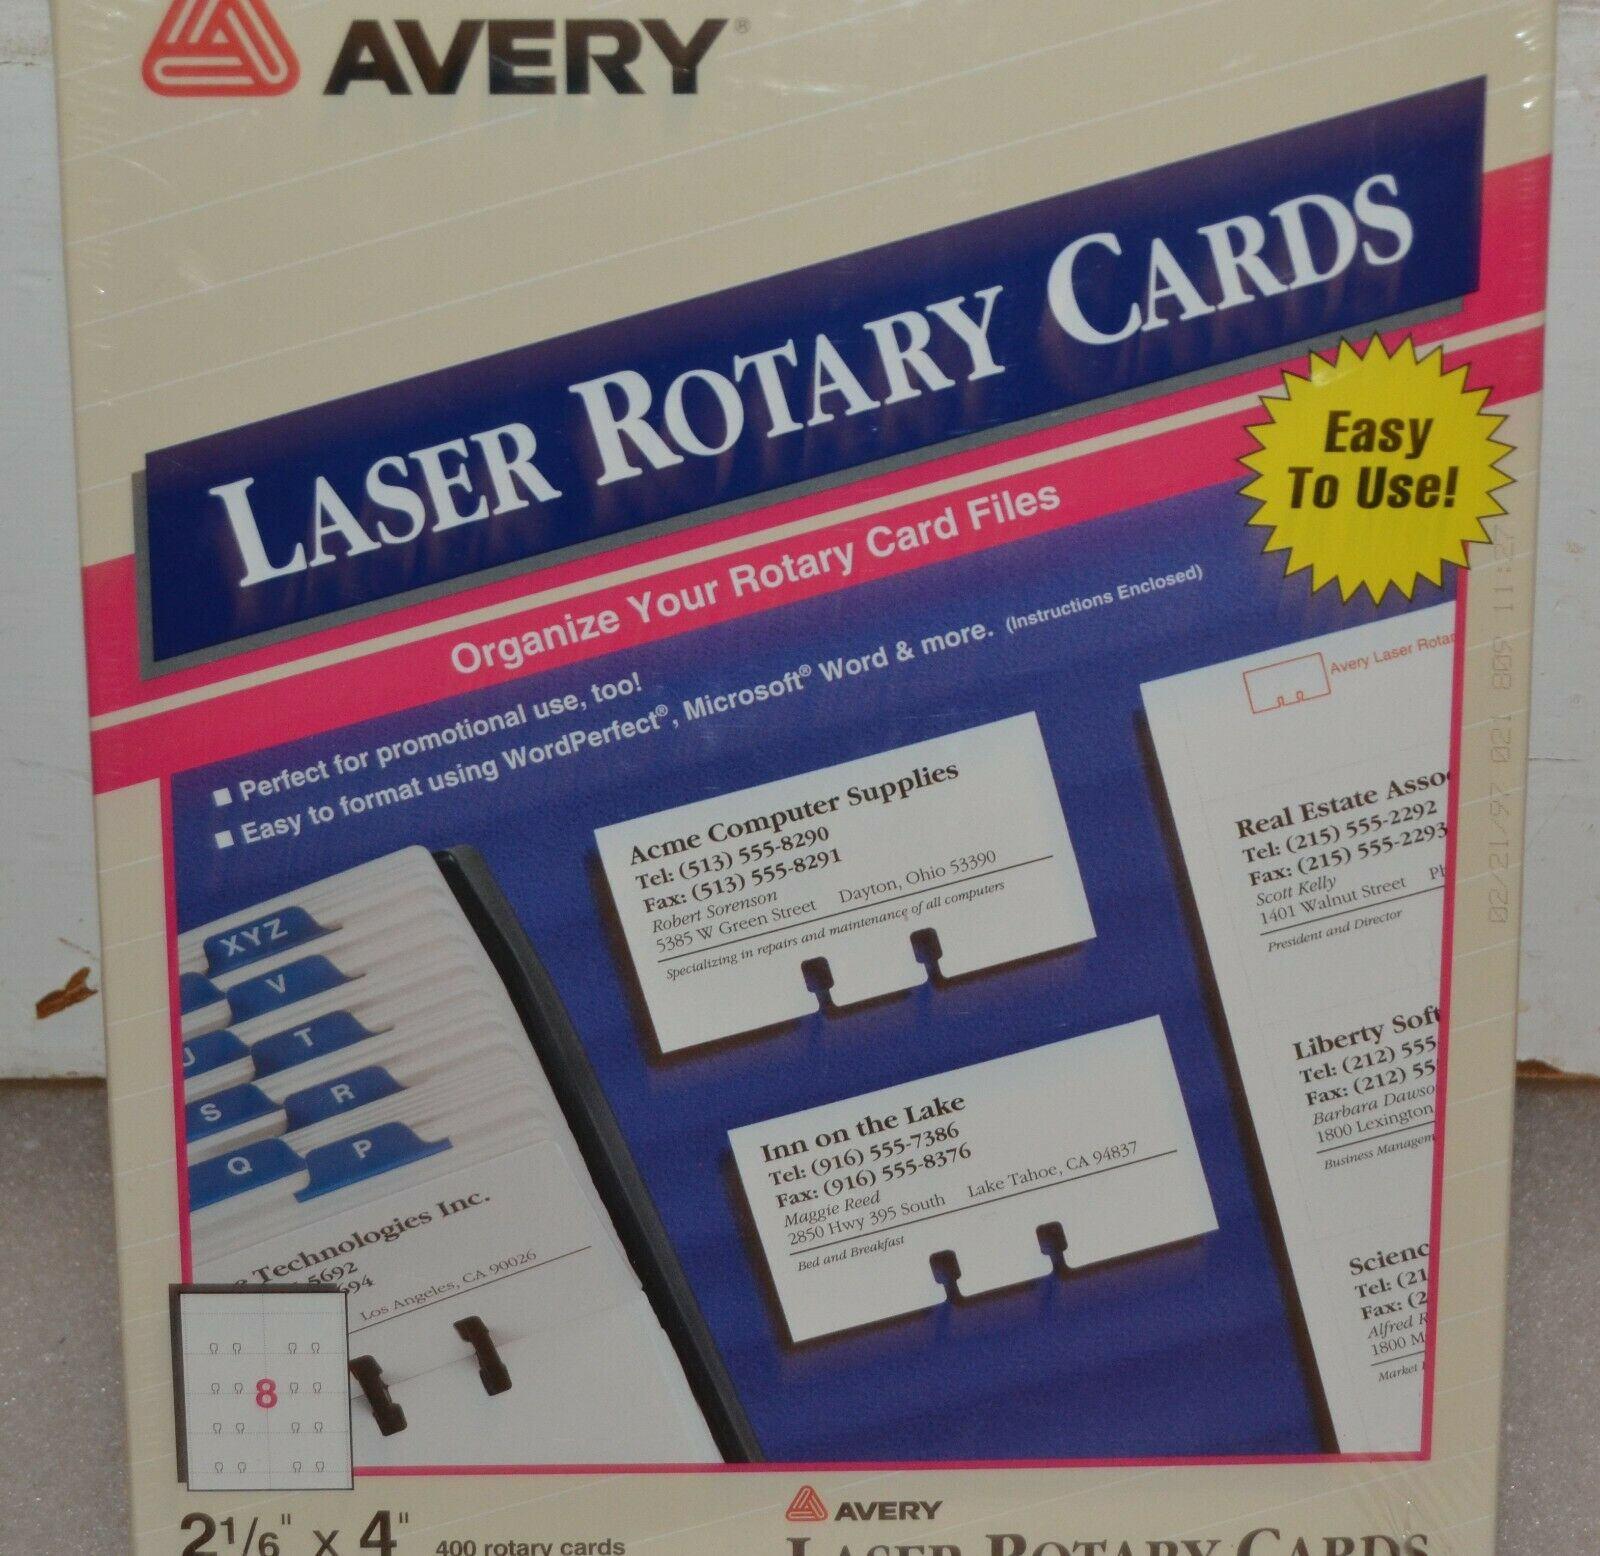 White Avery 5385 Rotary Card